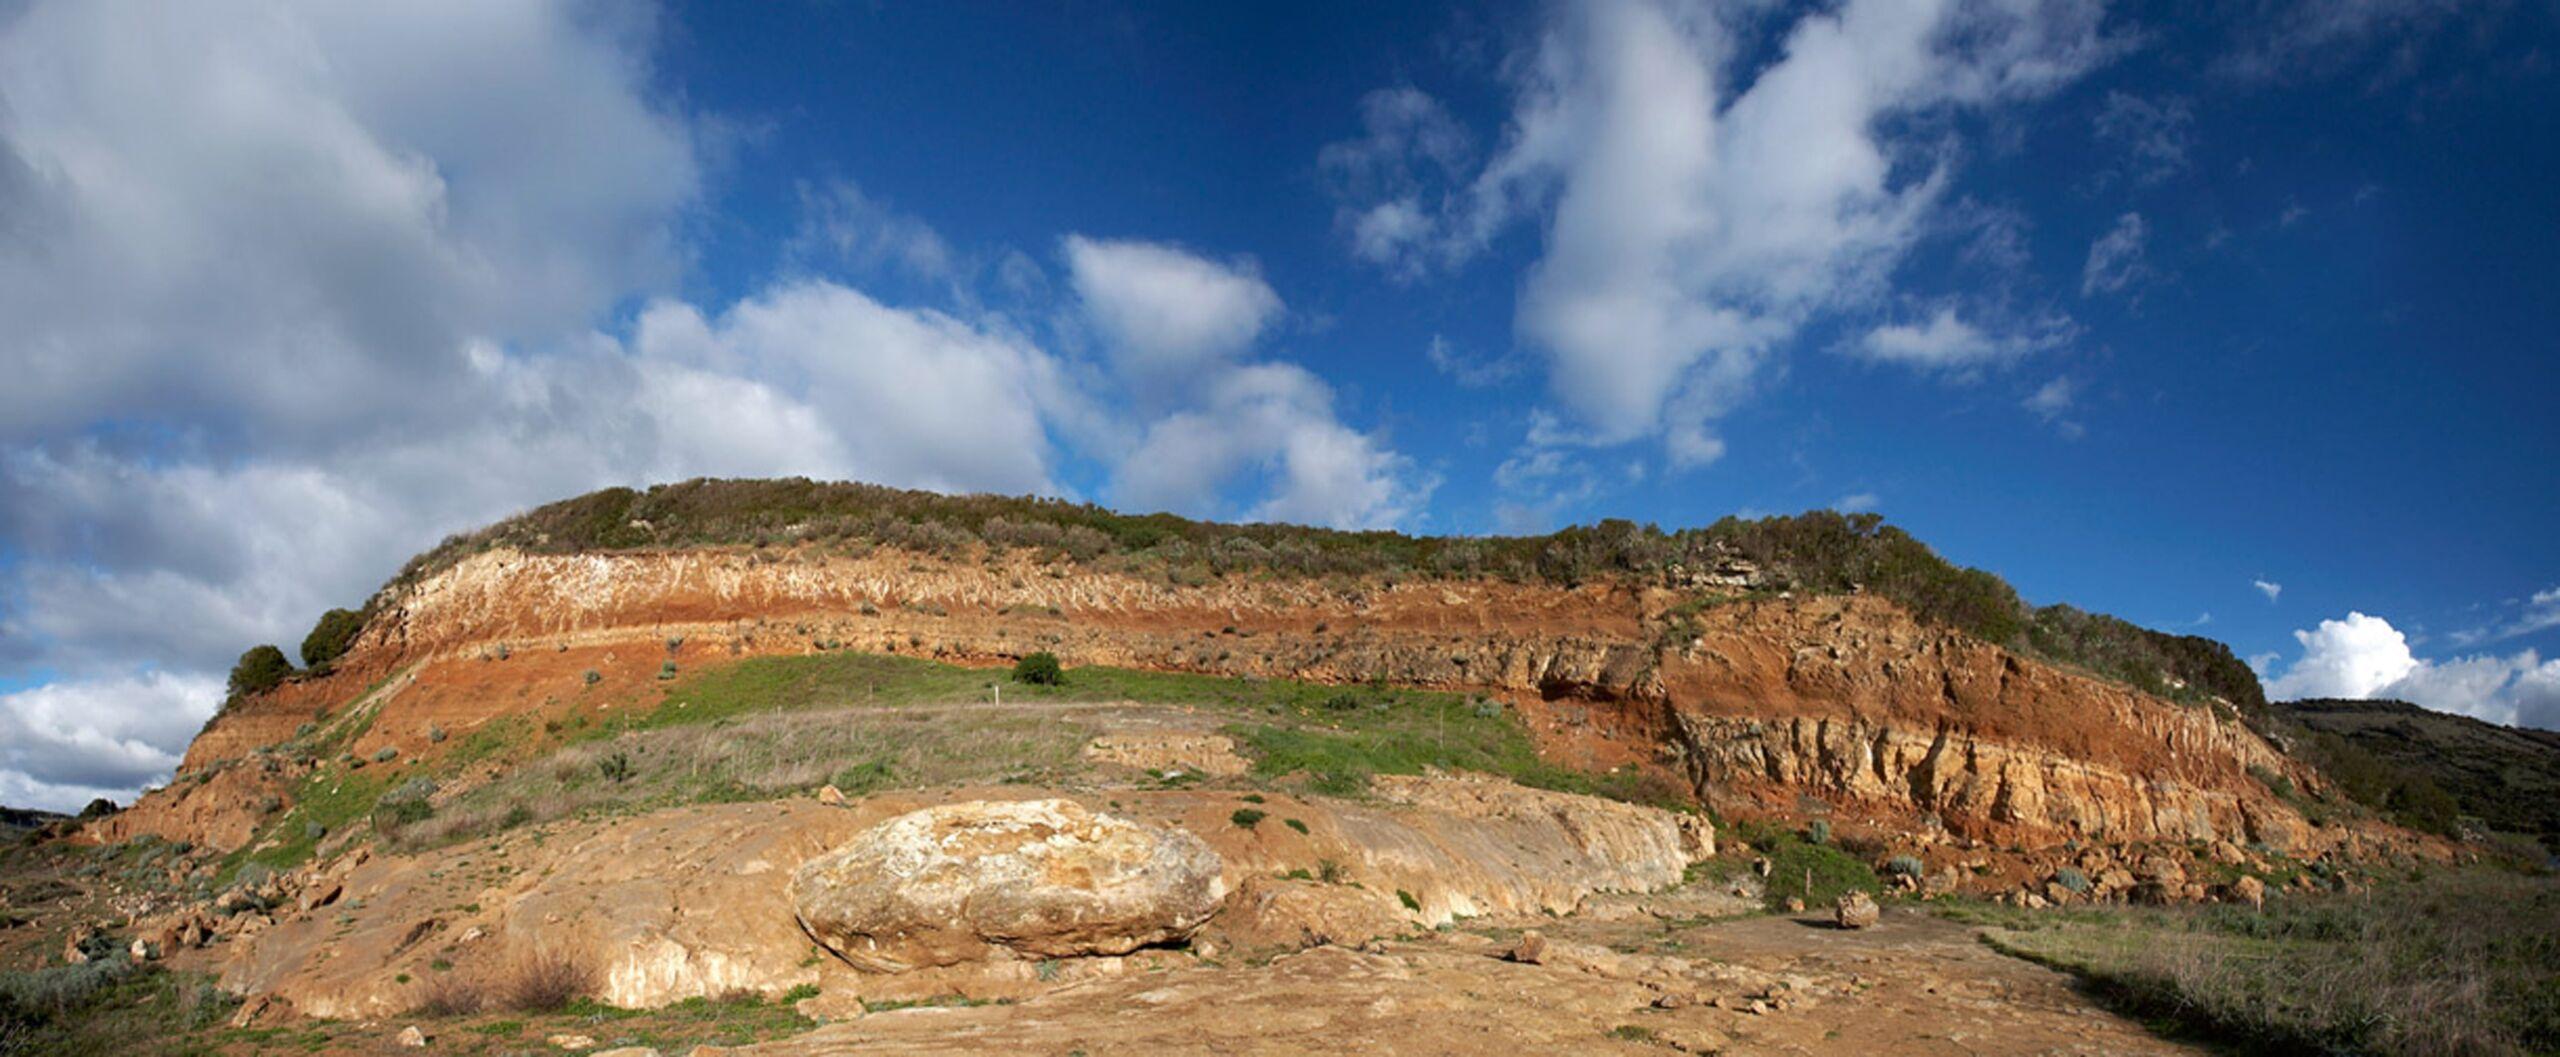 Panoramica Geosito